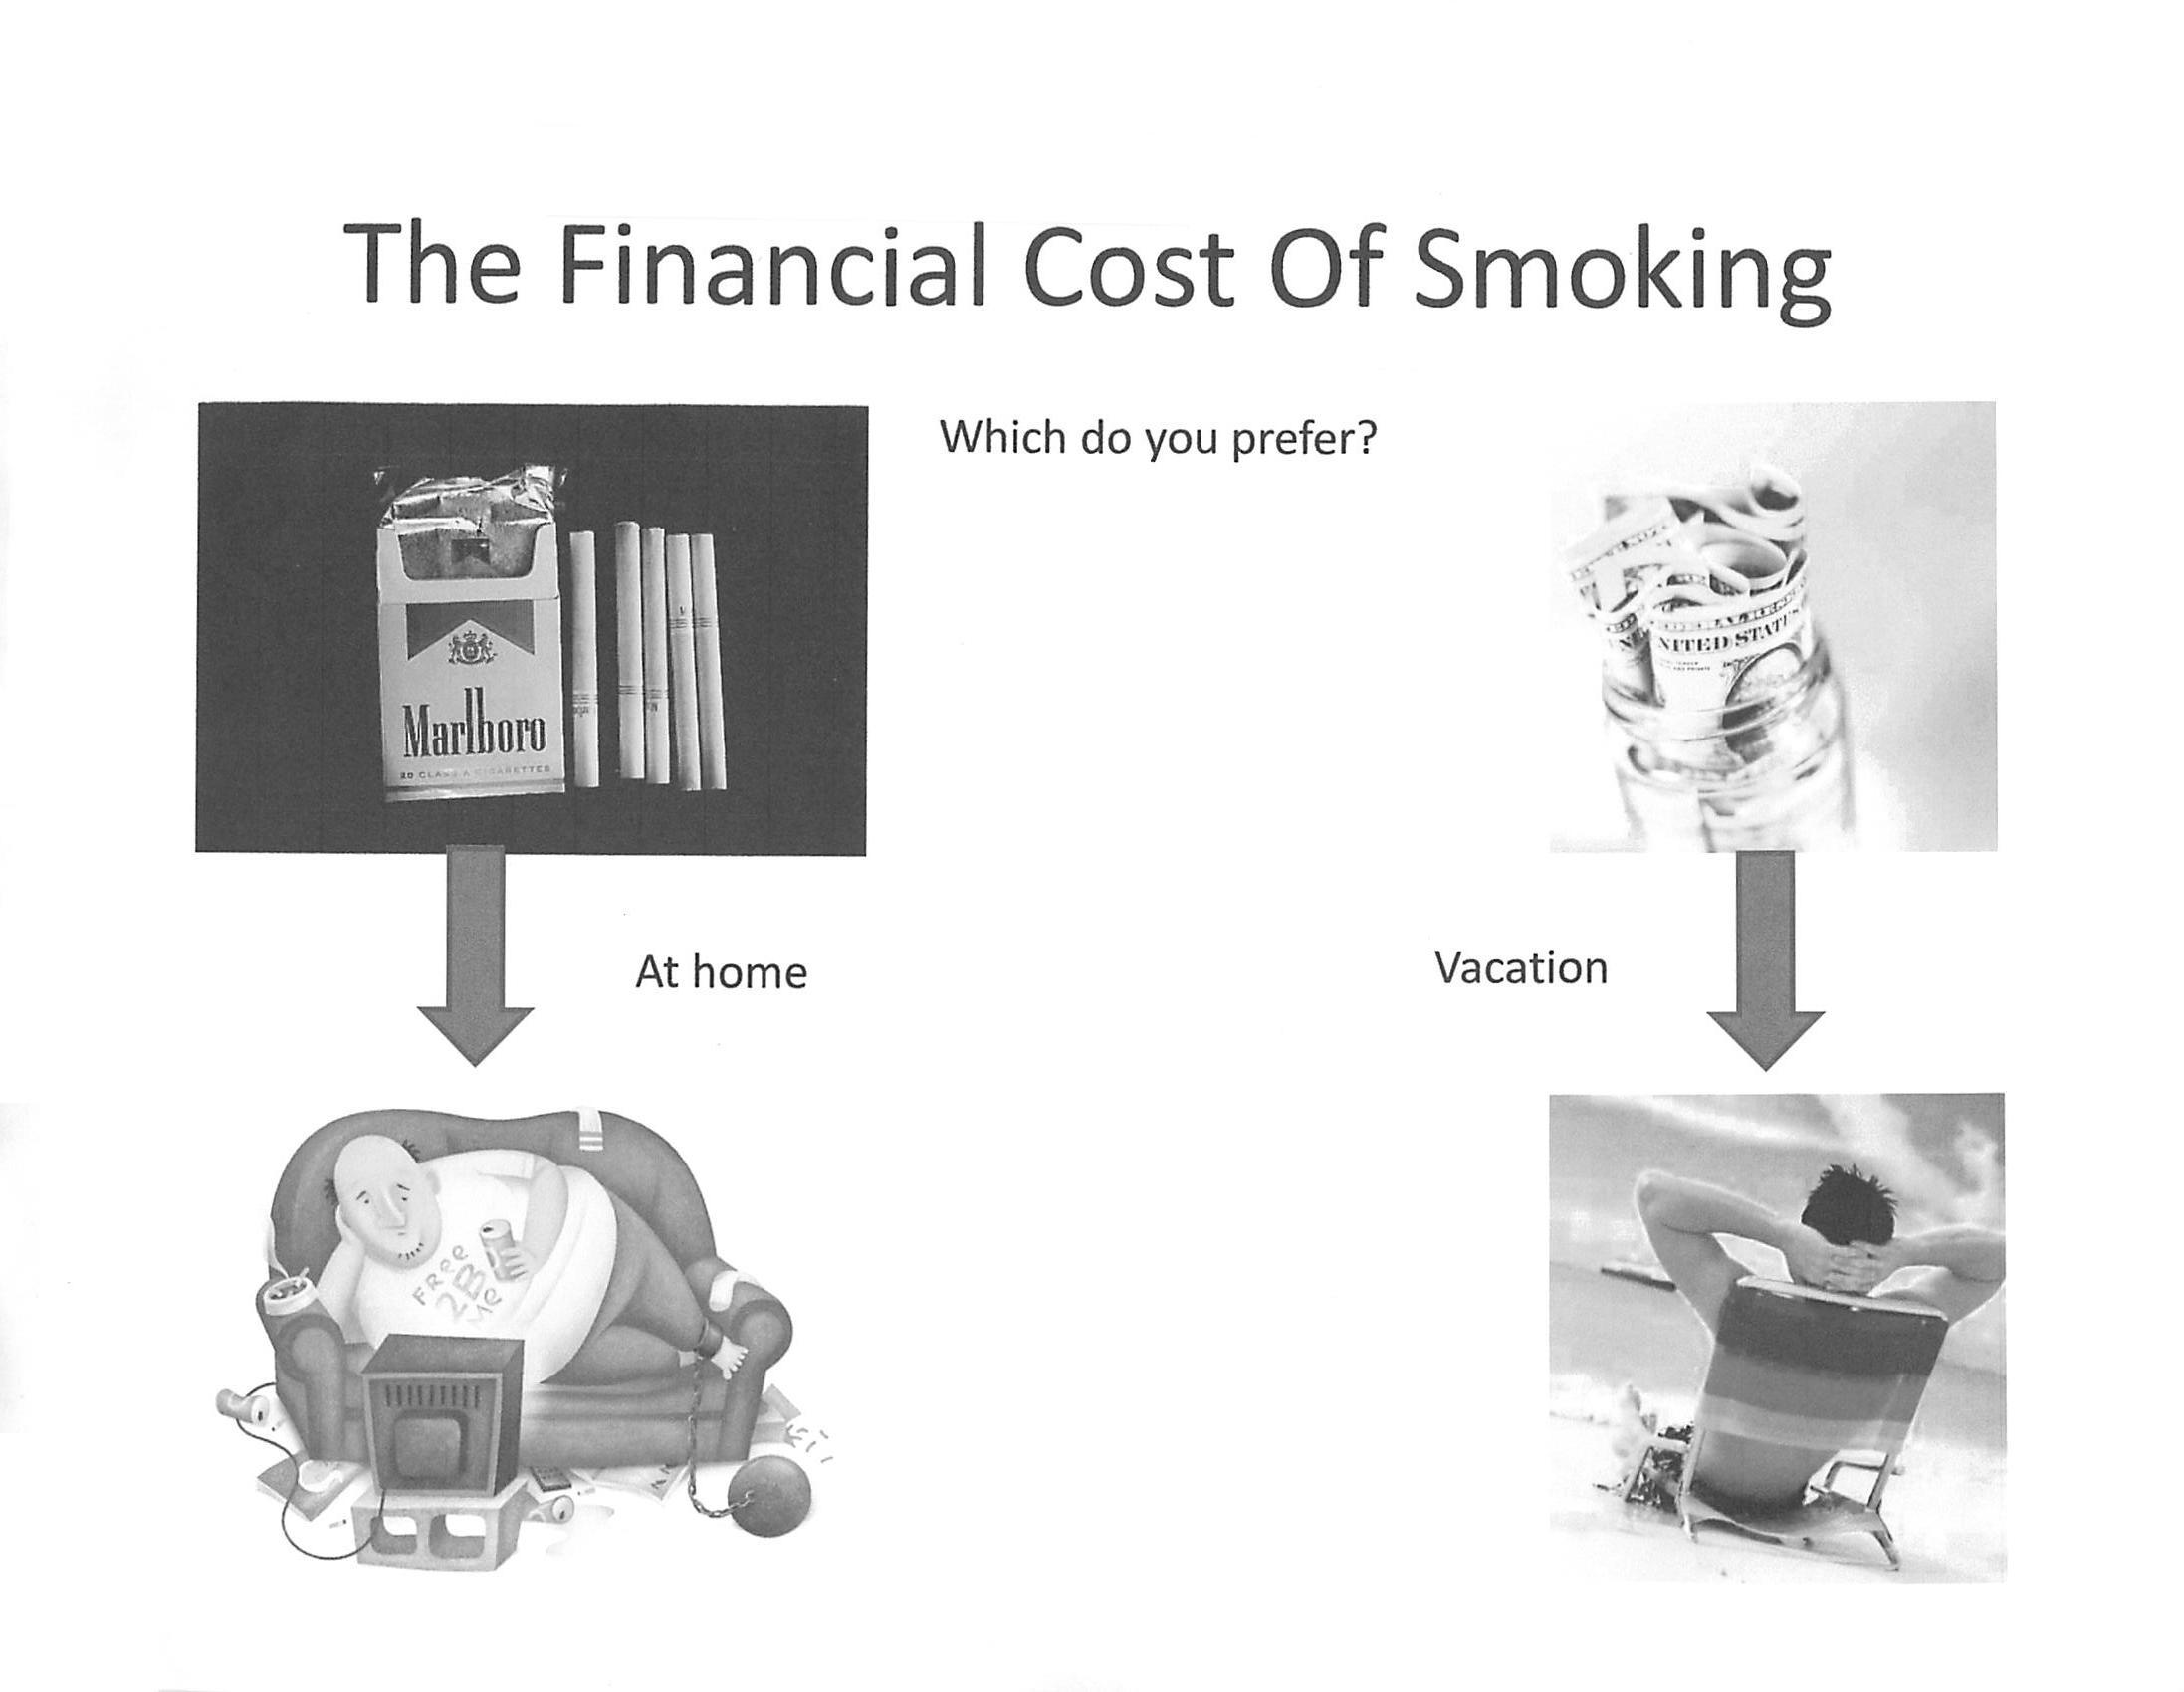 BUS-121, Financial Planning & Money Management